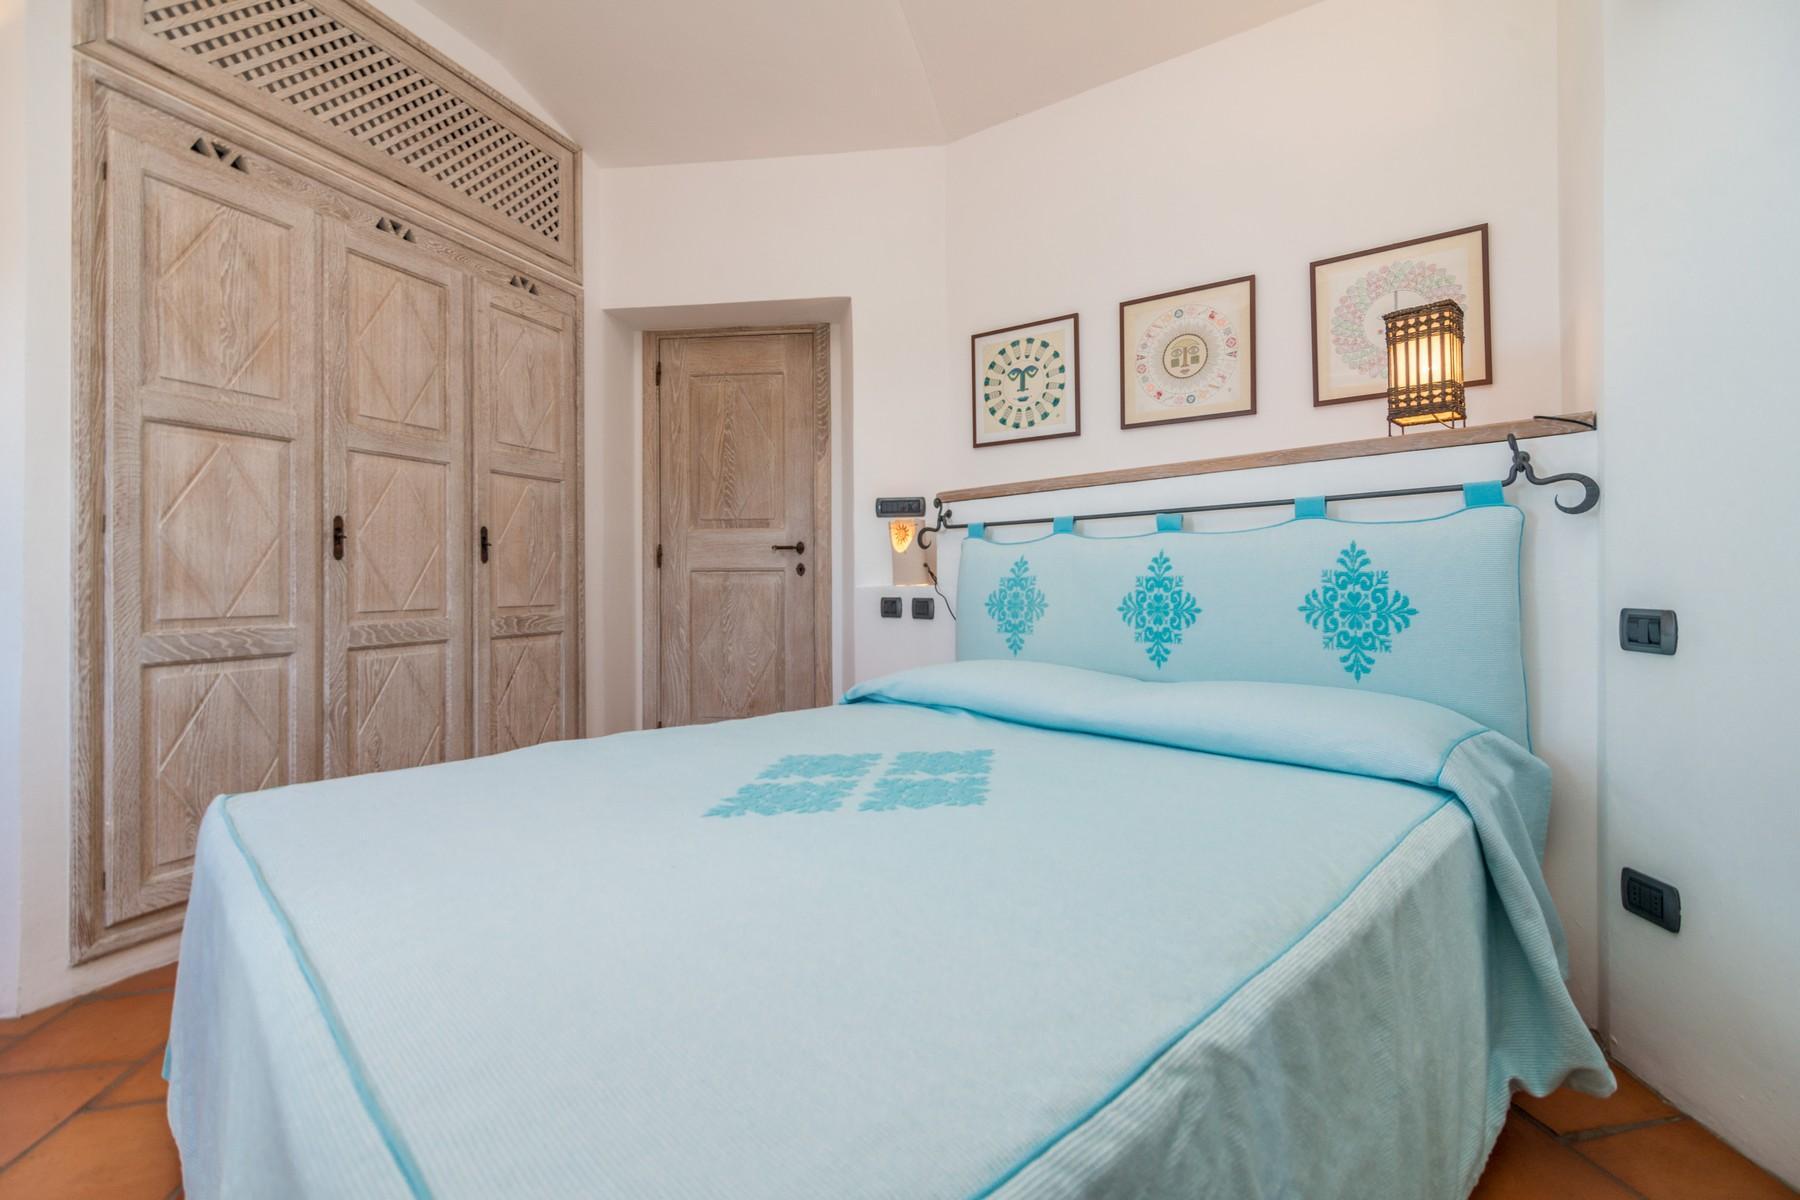 Porto Cervo Abbiadori Splendide villa jumelée avec vue sur le golfe de Pevero - 23